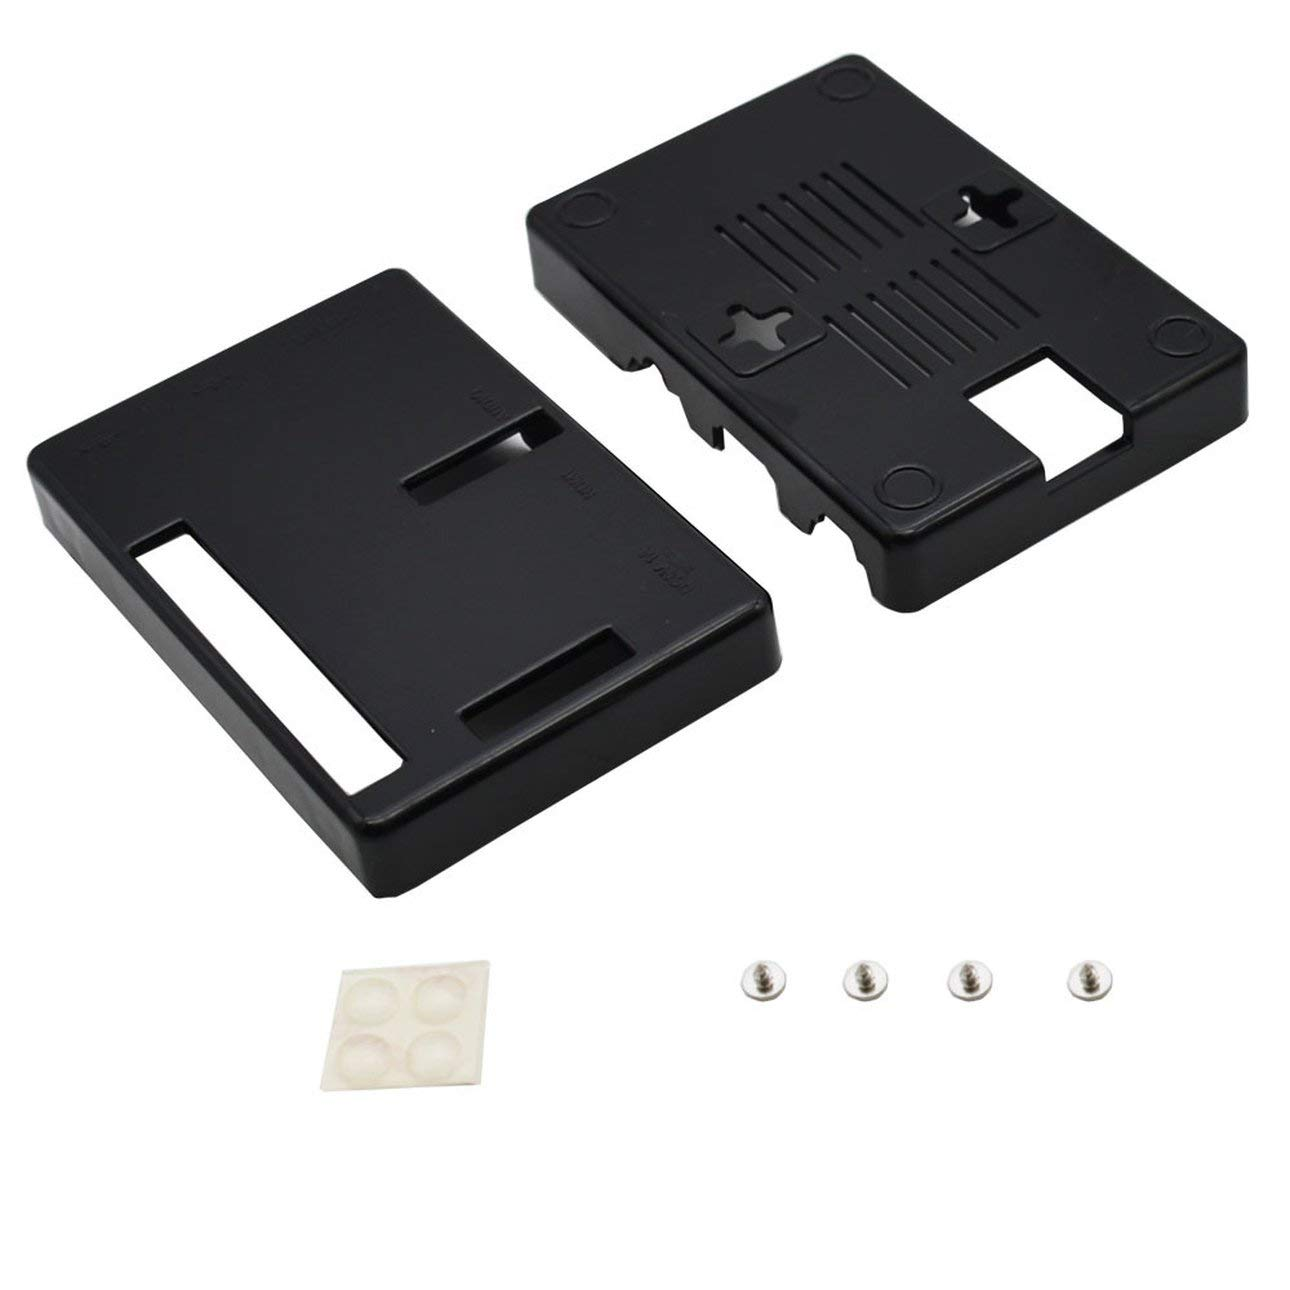 Liobaba Premium Black Case Boxes for Raspberry Pi 2 B Case Cover Enclosure Box ABS V2 Raspberry Pi Box